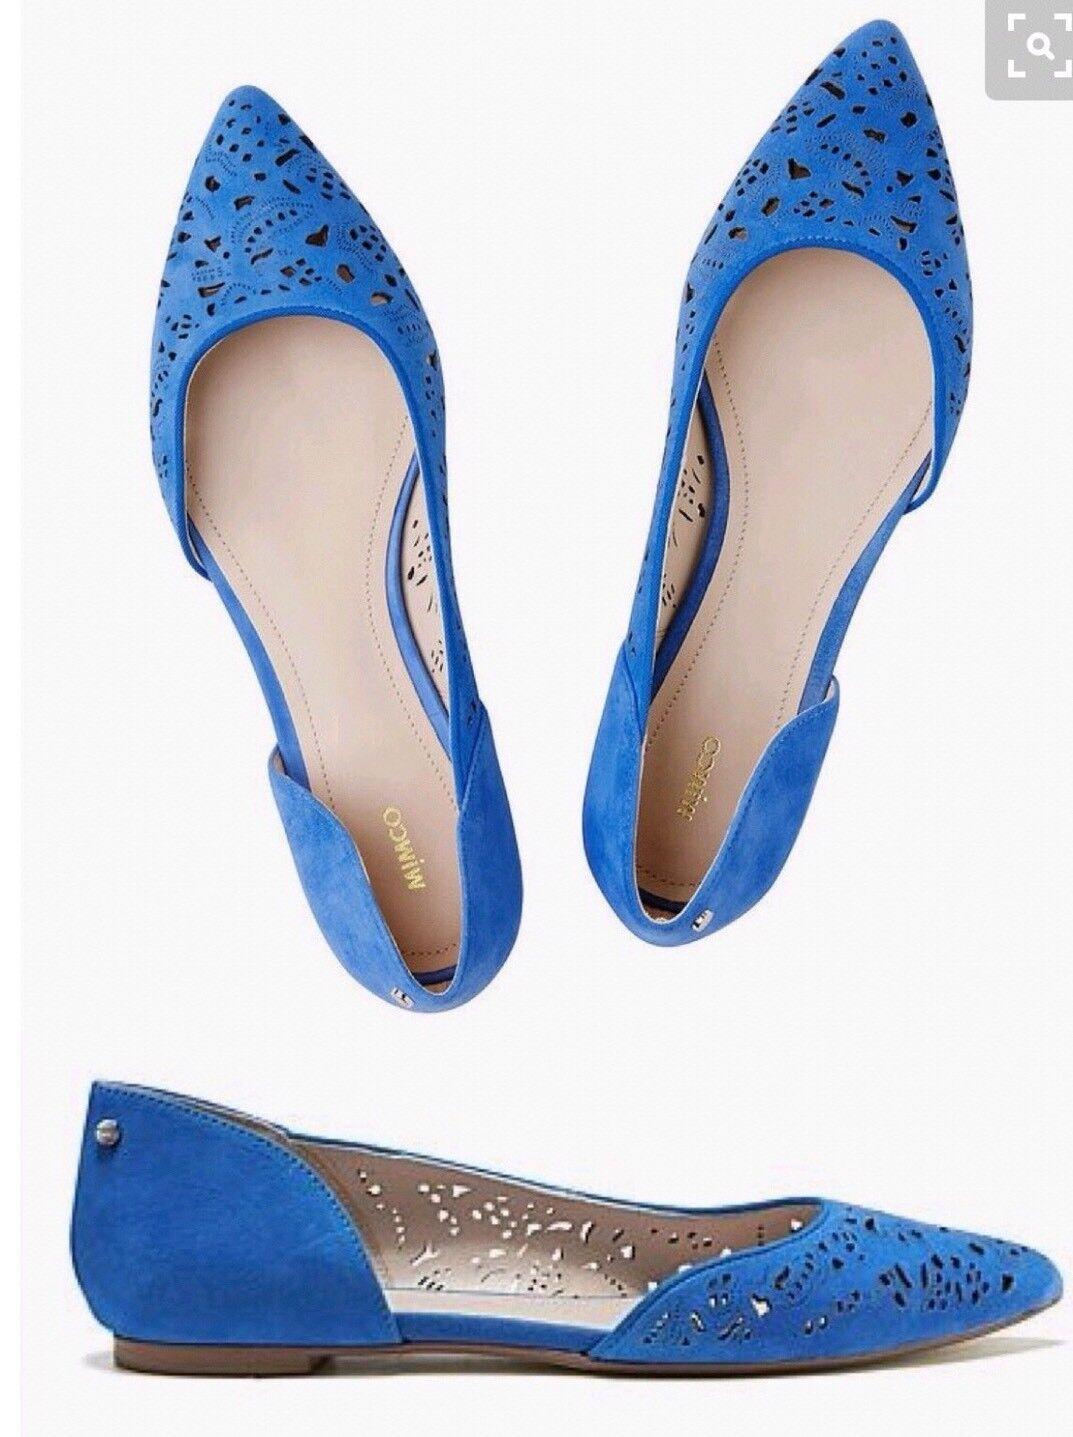 Mimco New Venice Blue Leather Romantico Flats Sandals Shoes Ballets 36 Or 5 $199